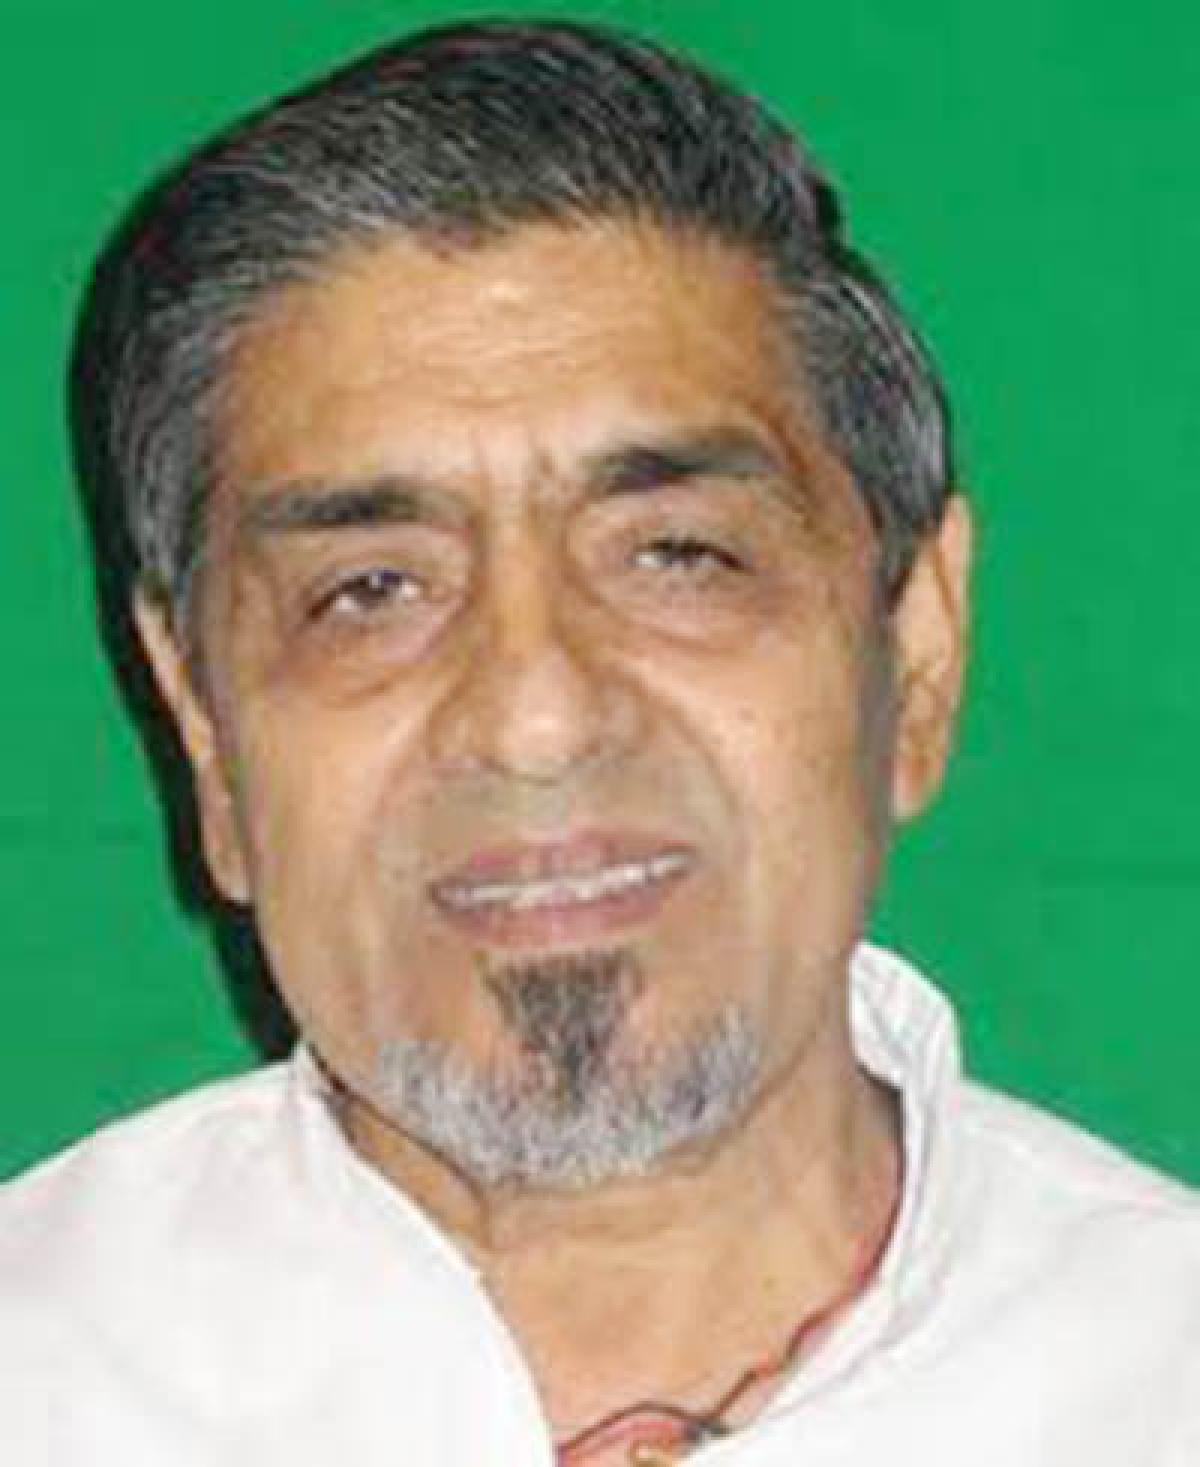 Tytler got clean chit after Manmohan meet, says Verma